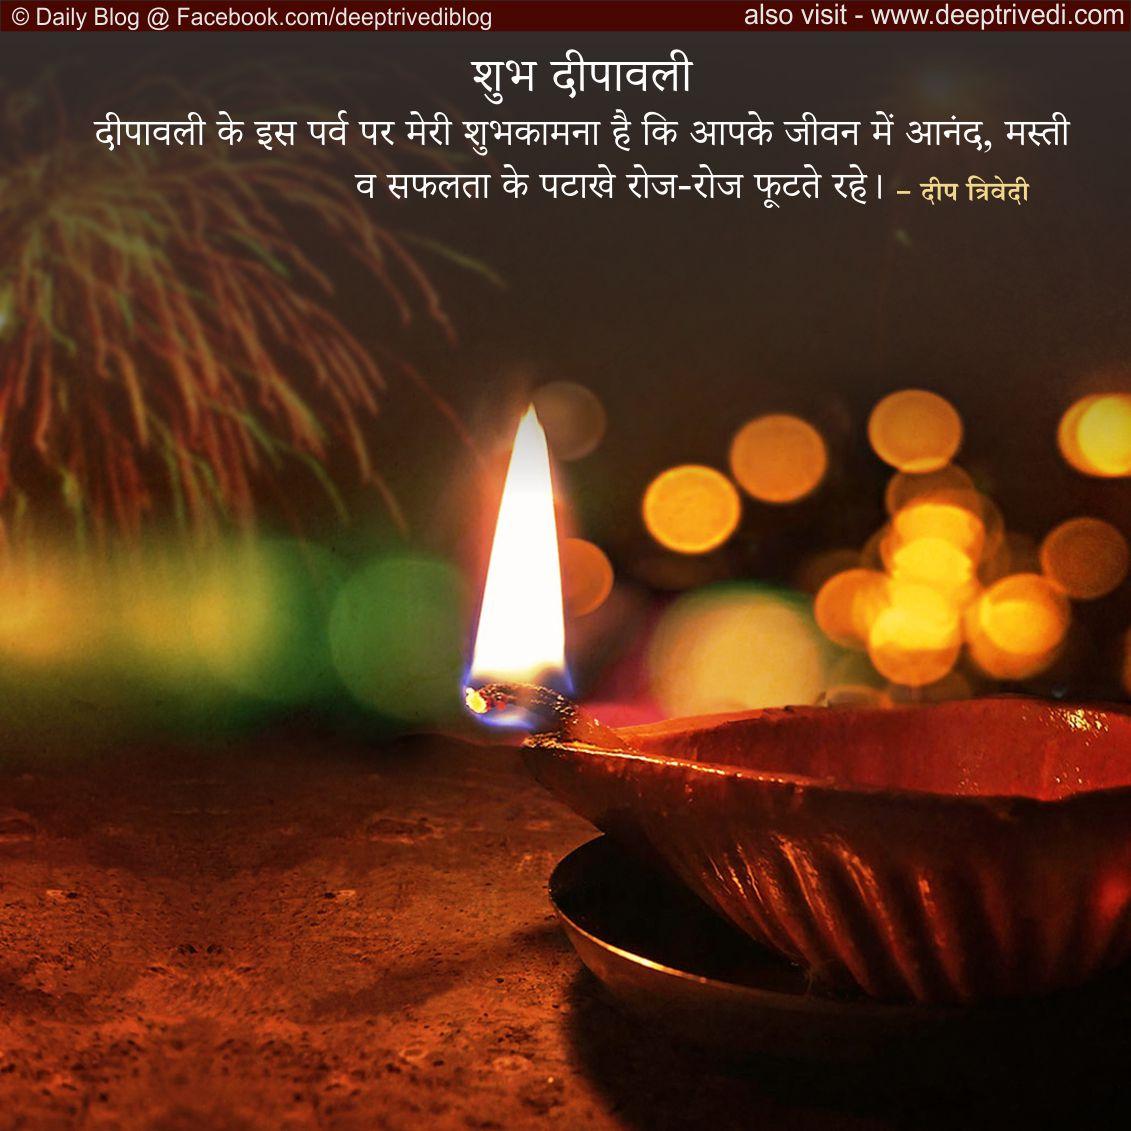 B 102 hindi image change